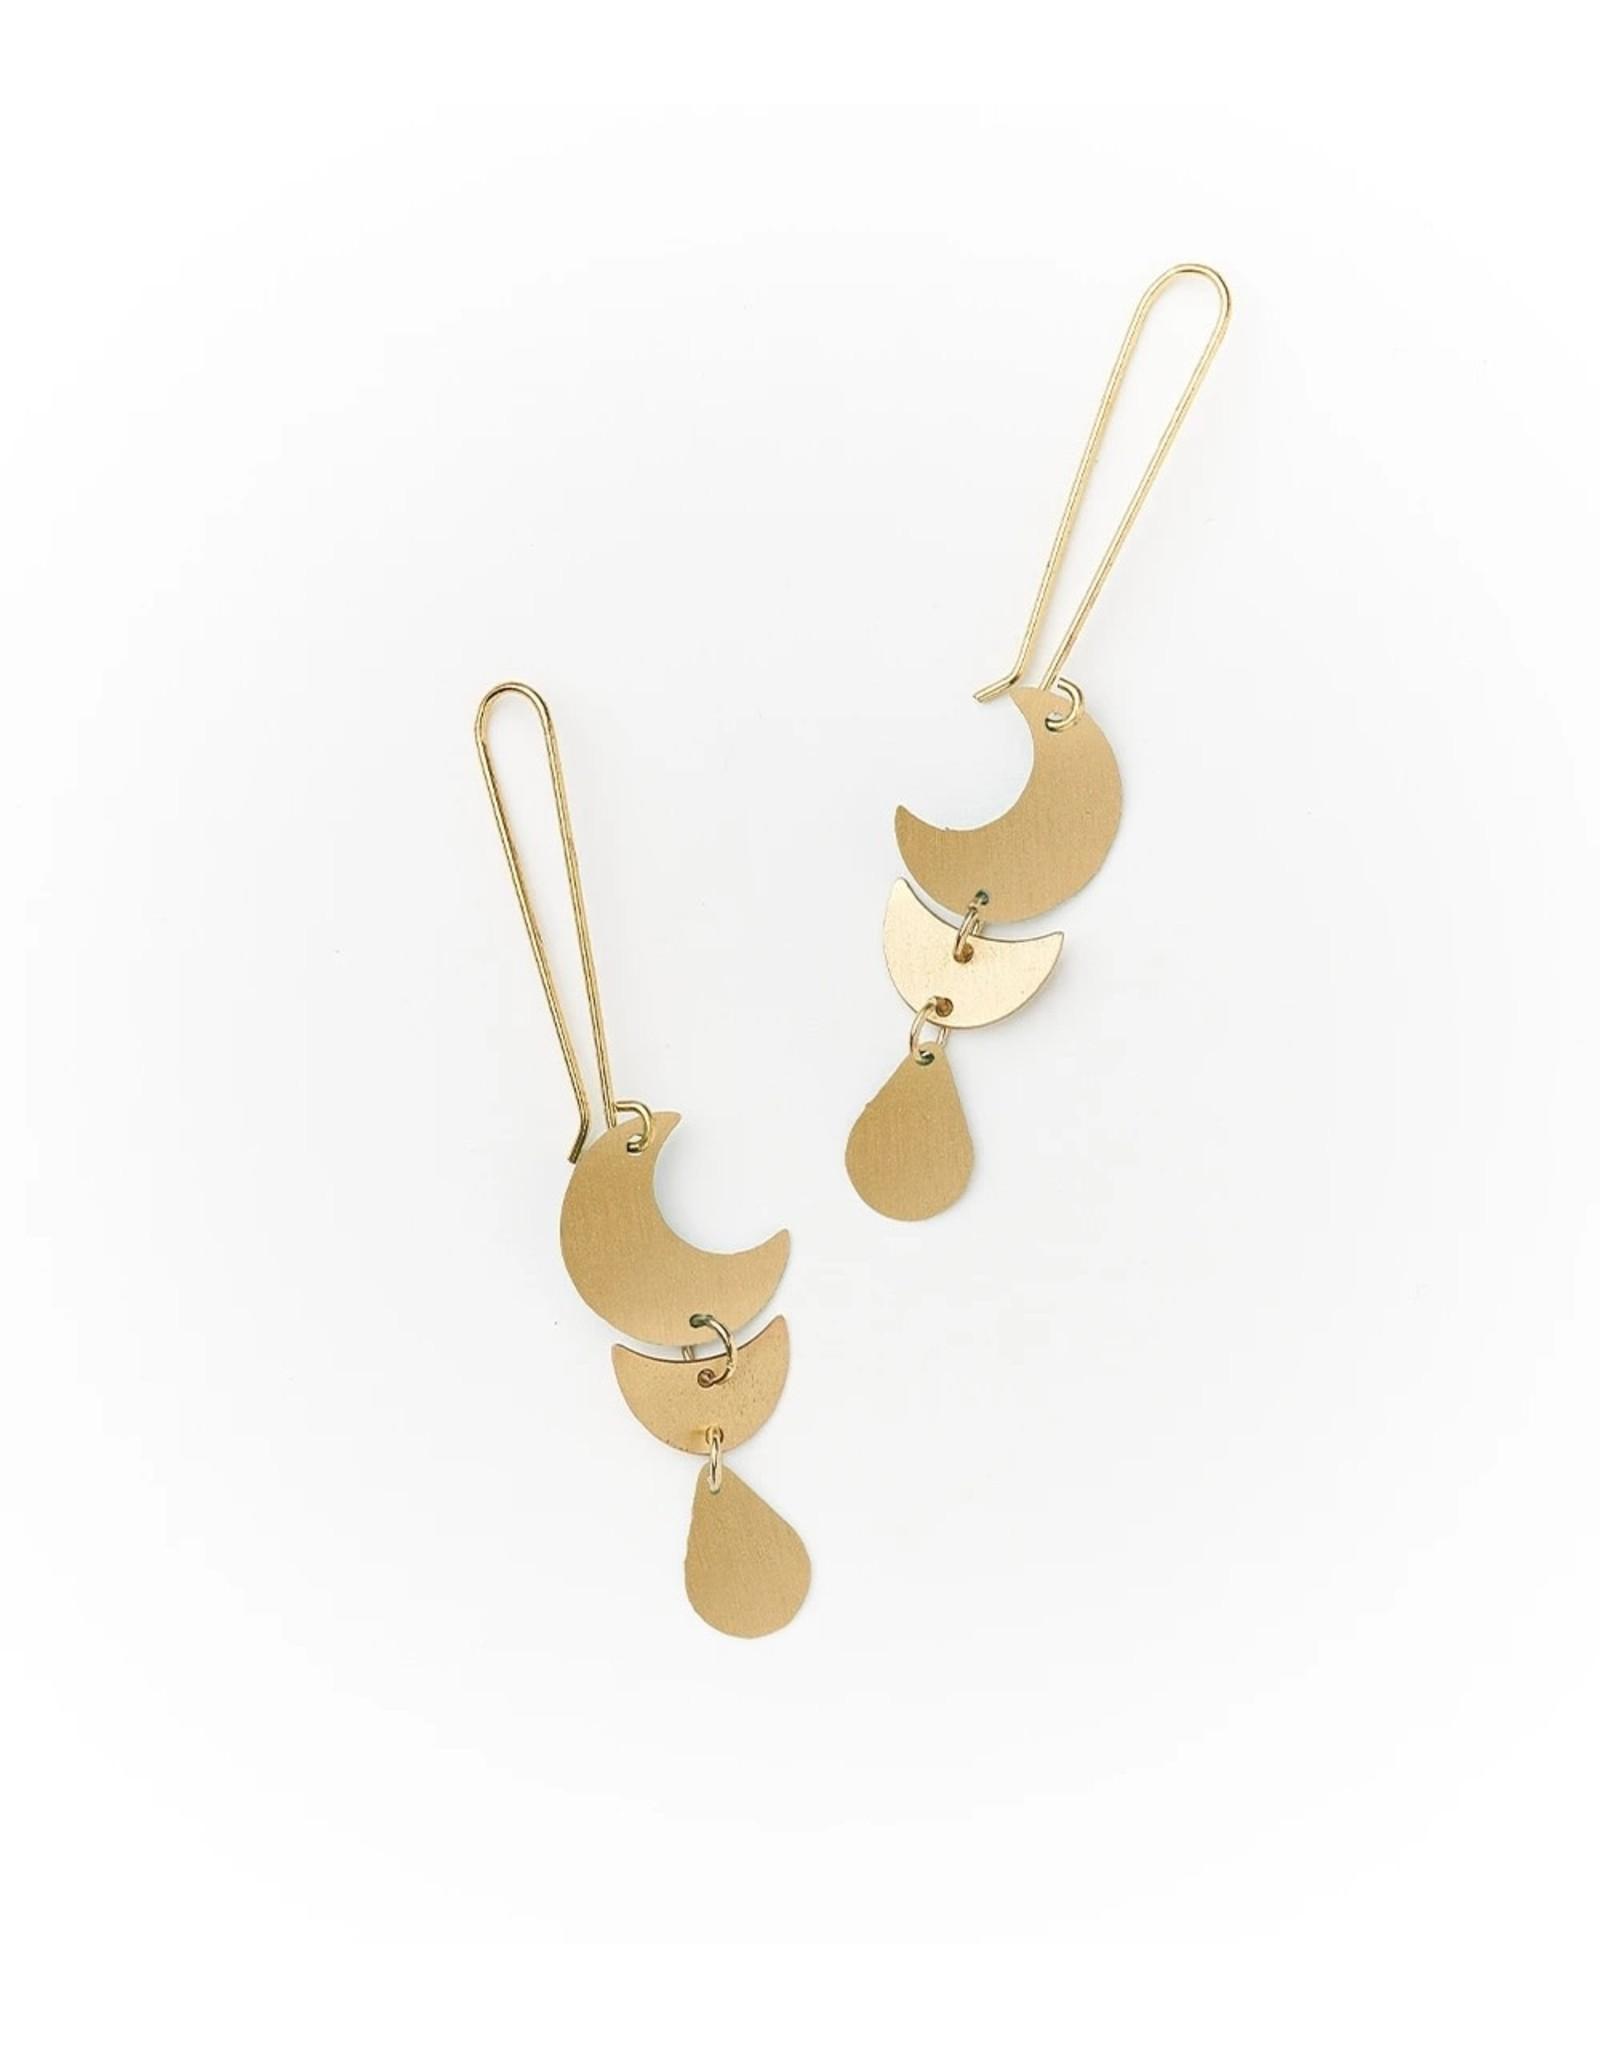 Matr Boomie Rajani earrings, Gold Drop, India